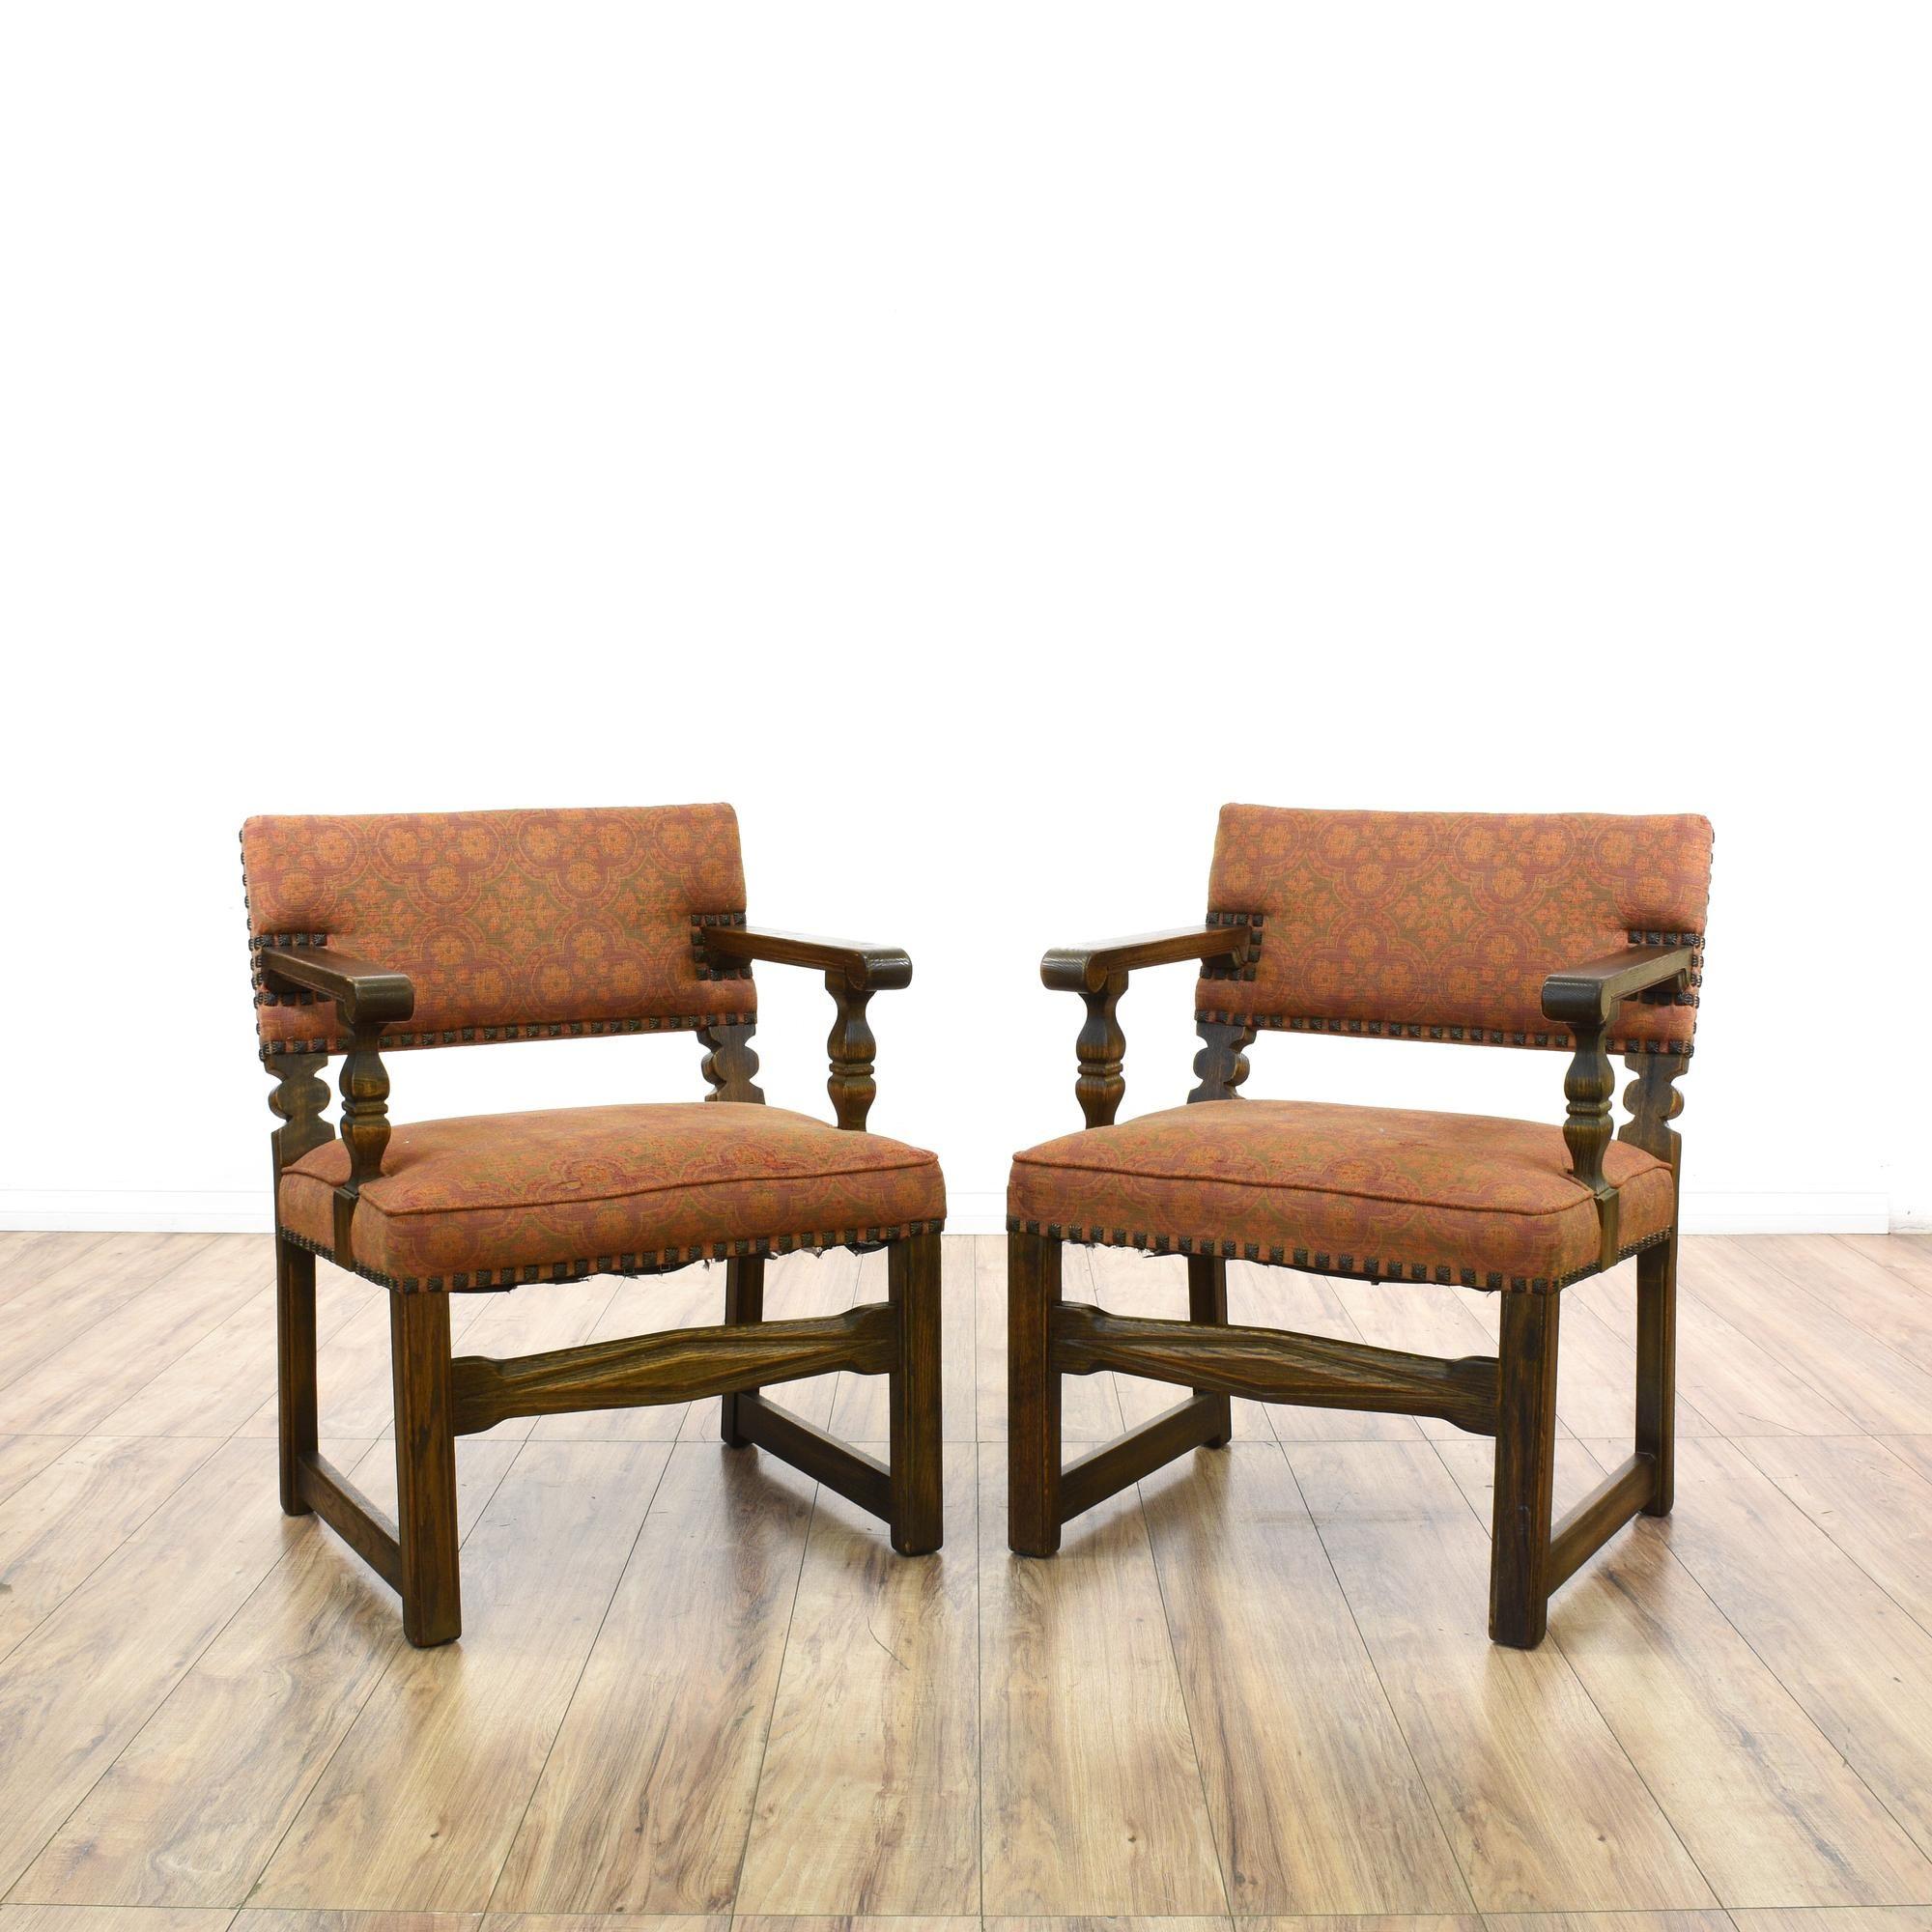 Pair Orange Spanish Revival Accent Chairs